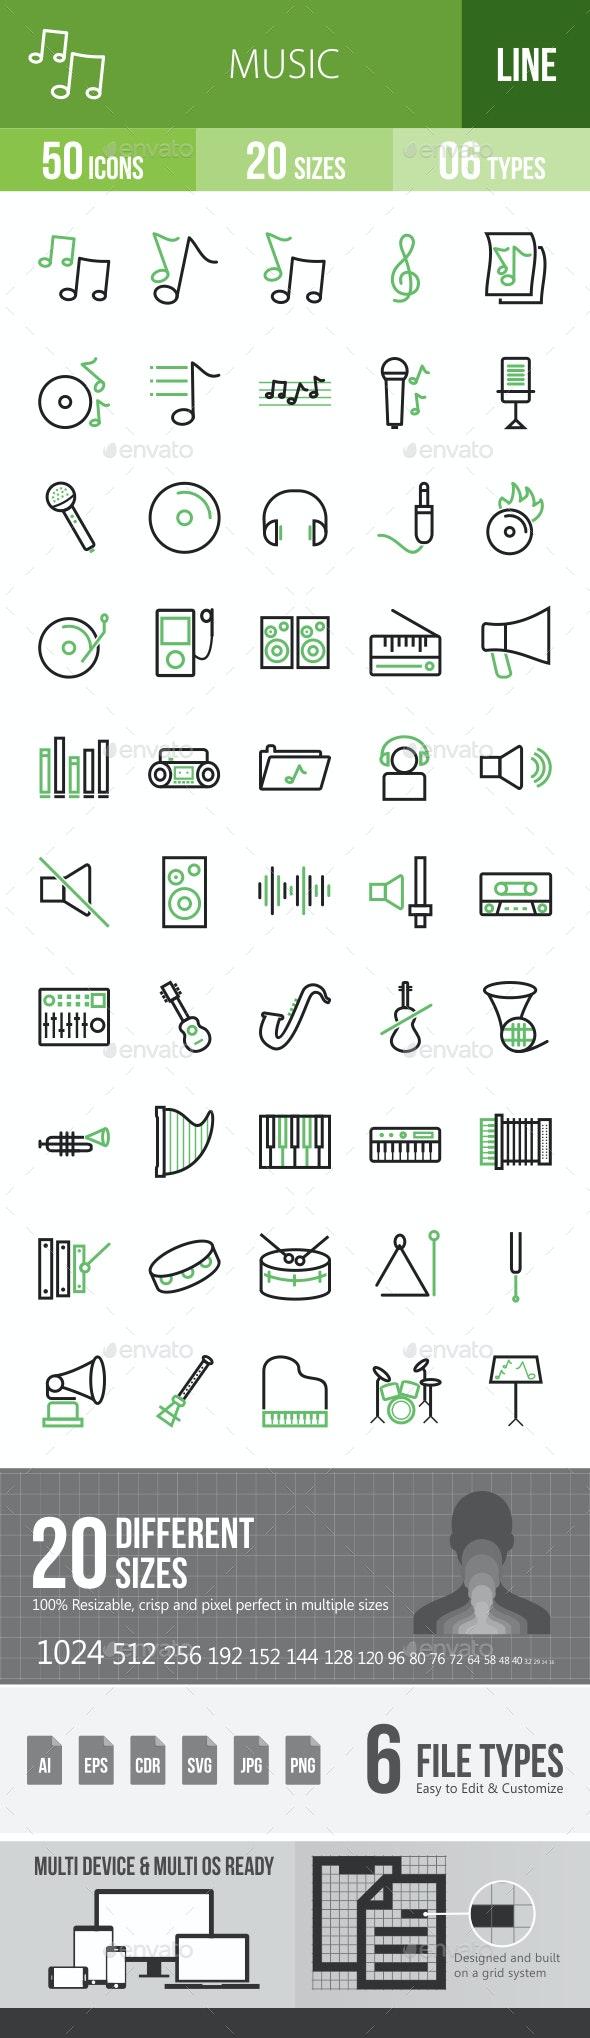 Music Line Green & Black Icons - Icons